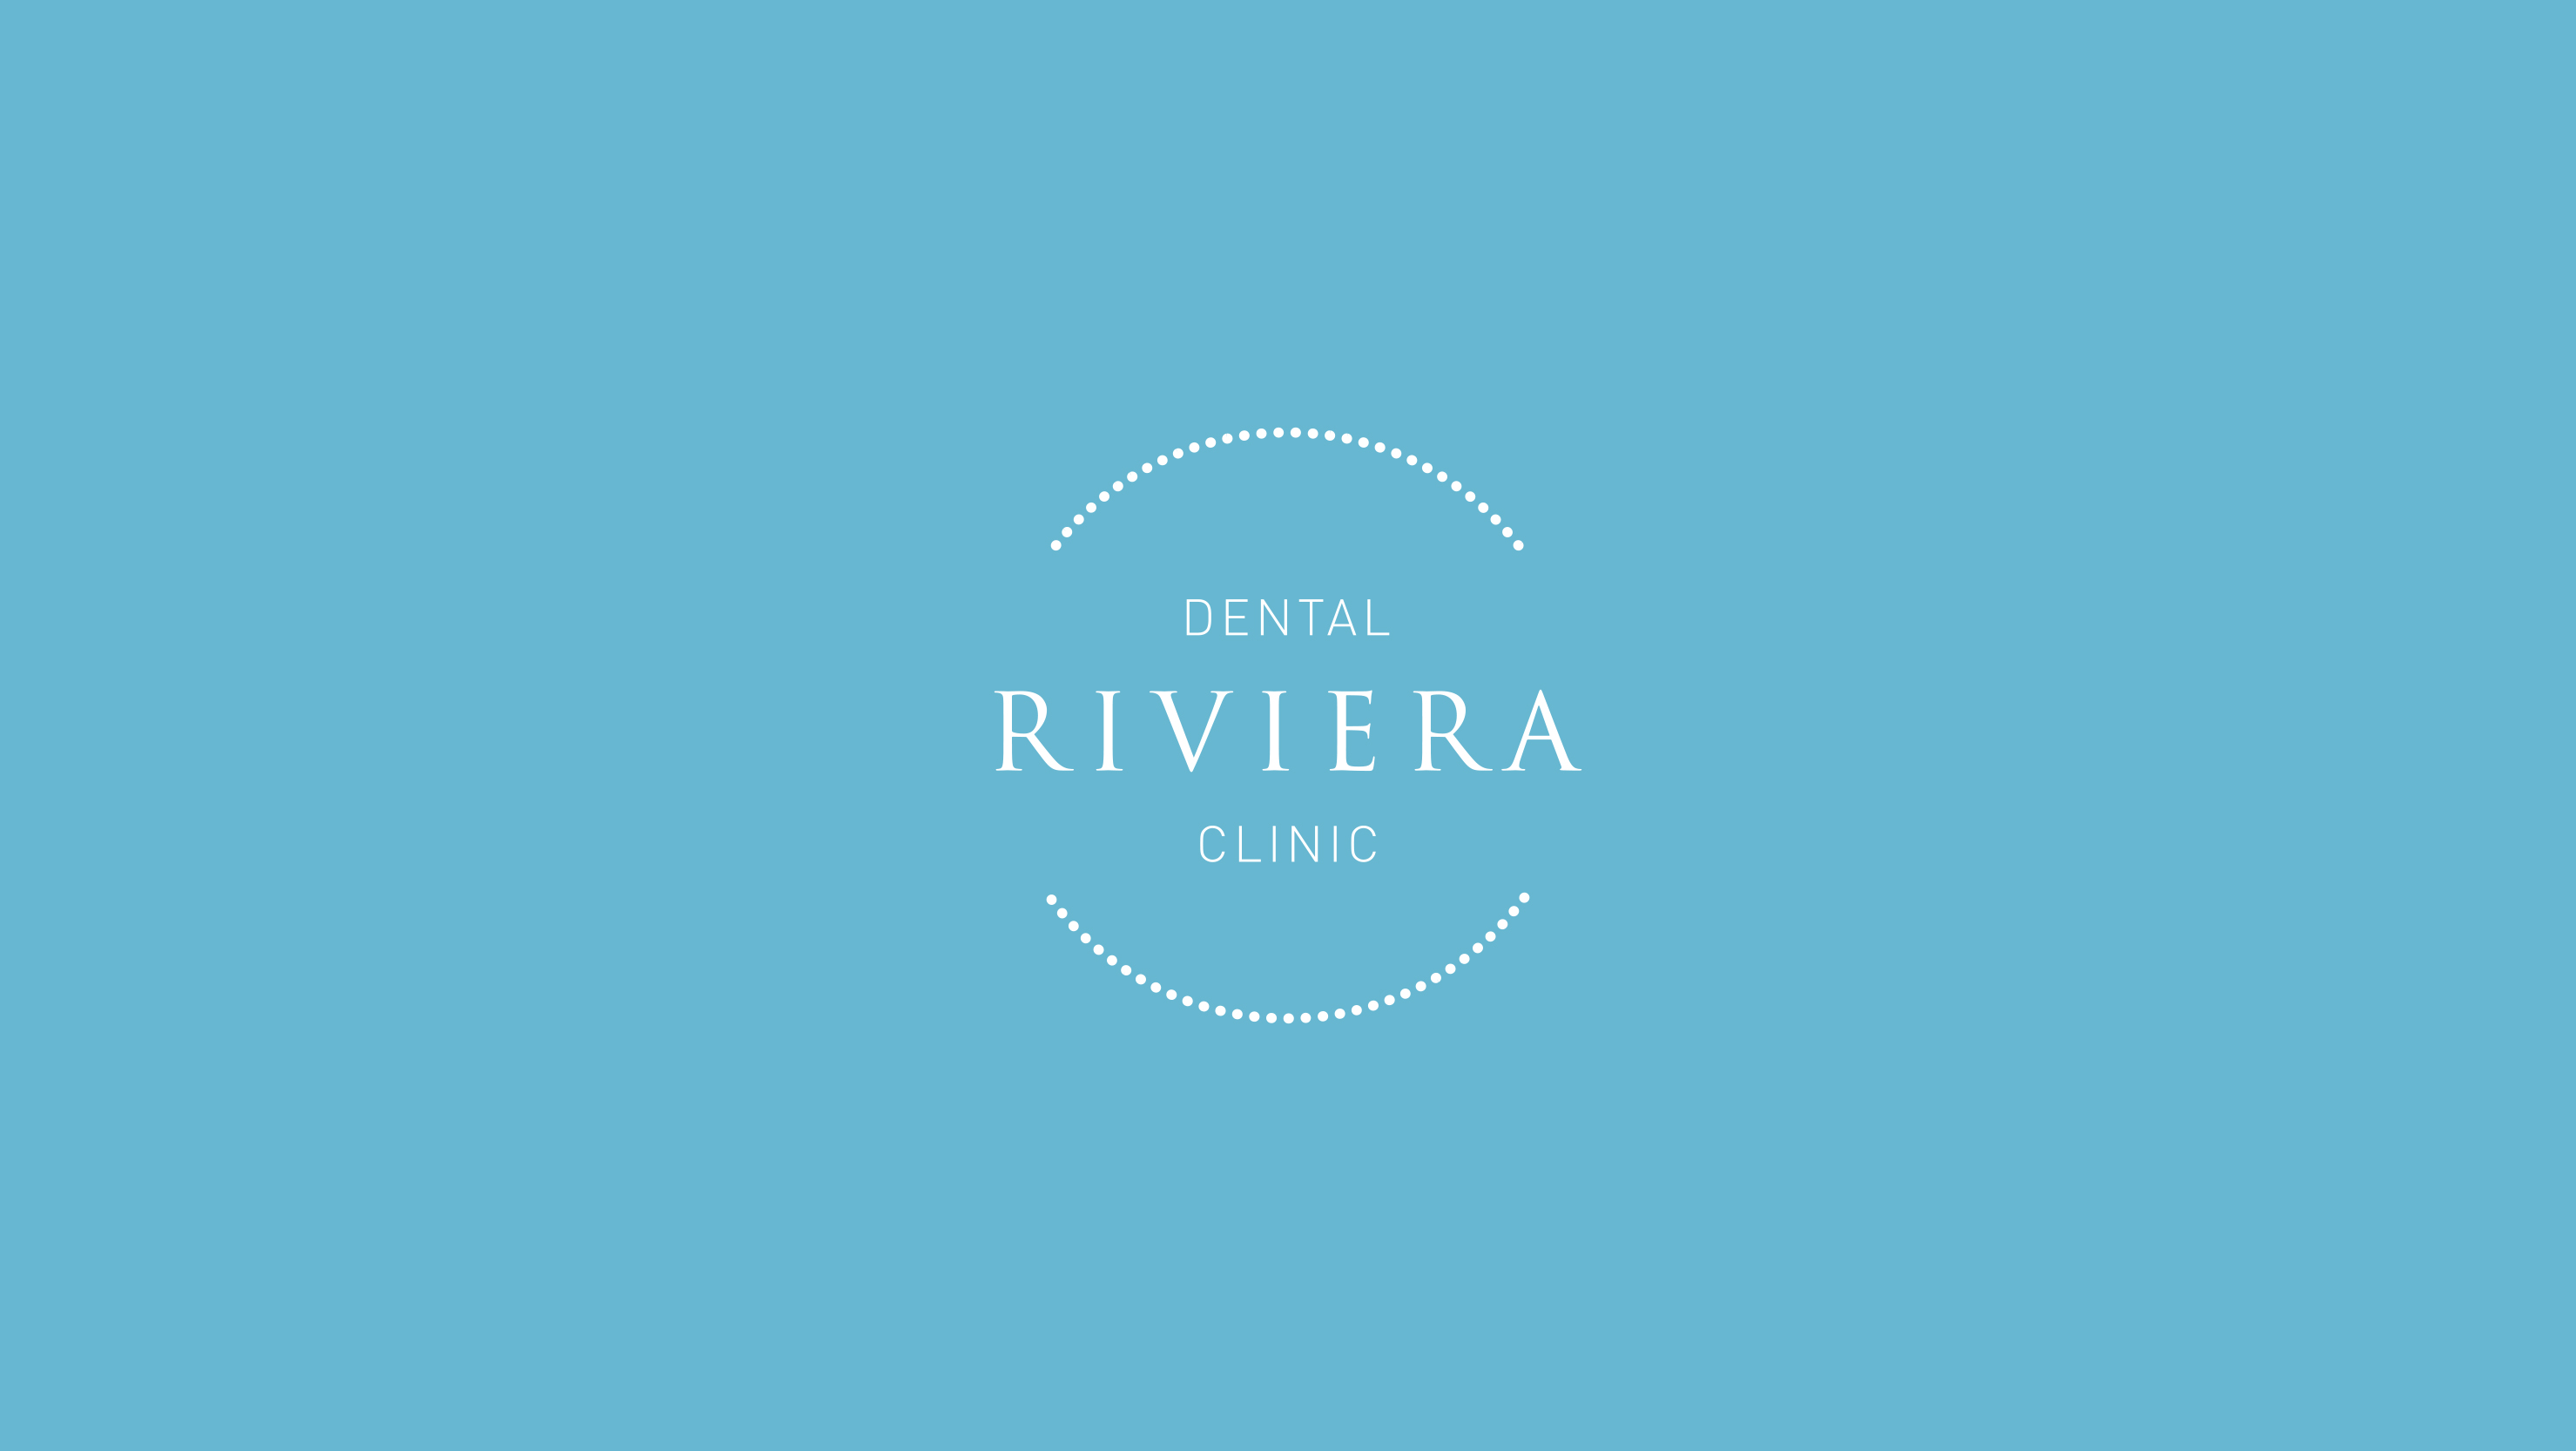 Dental Riviera Clinic